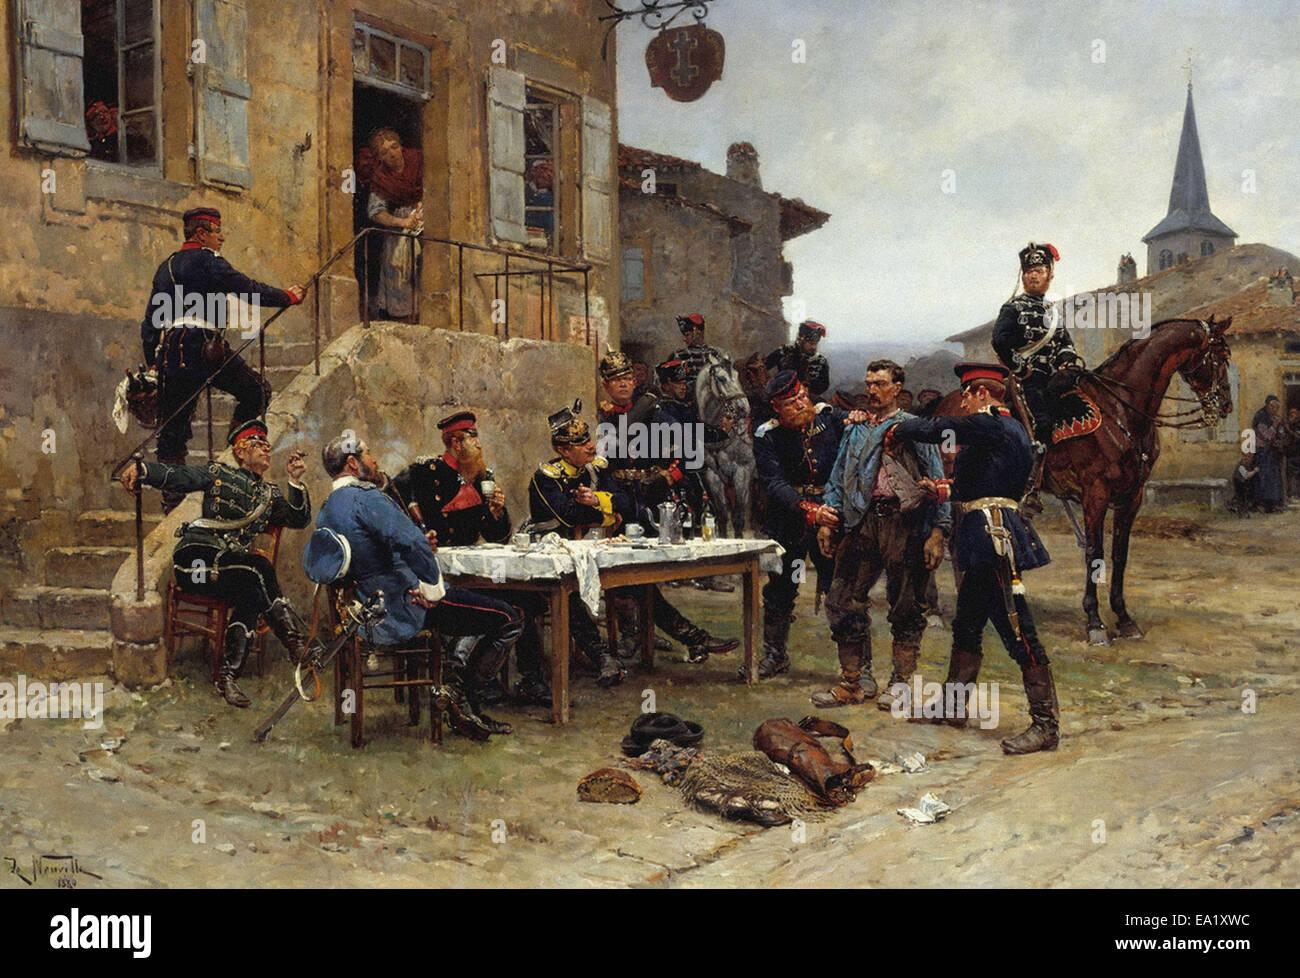 Alphonse-Marie-Adolphe de Neuville  The Spy Stock Photo